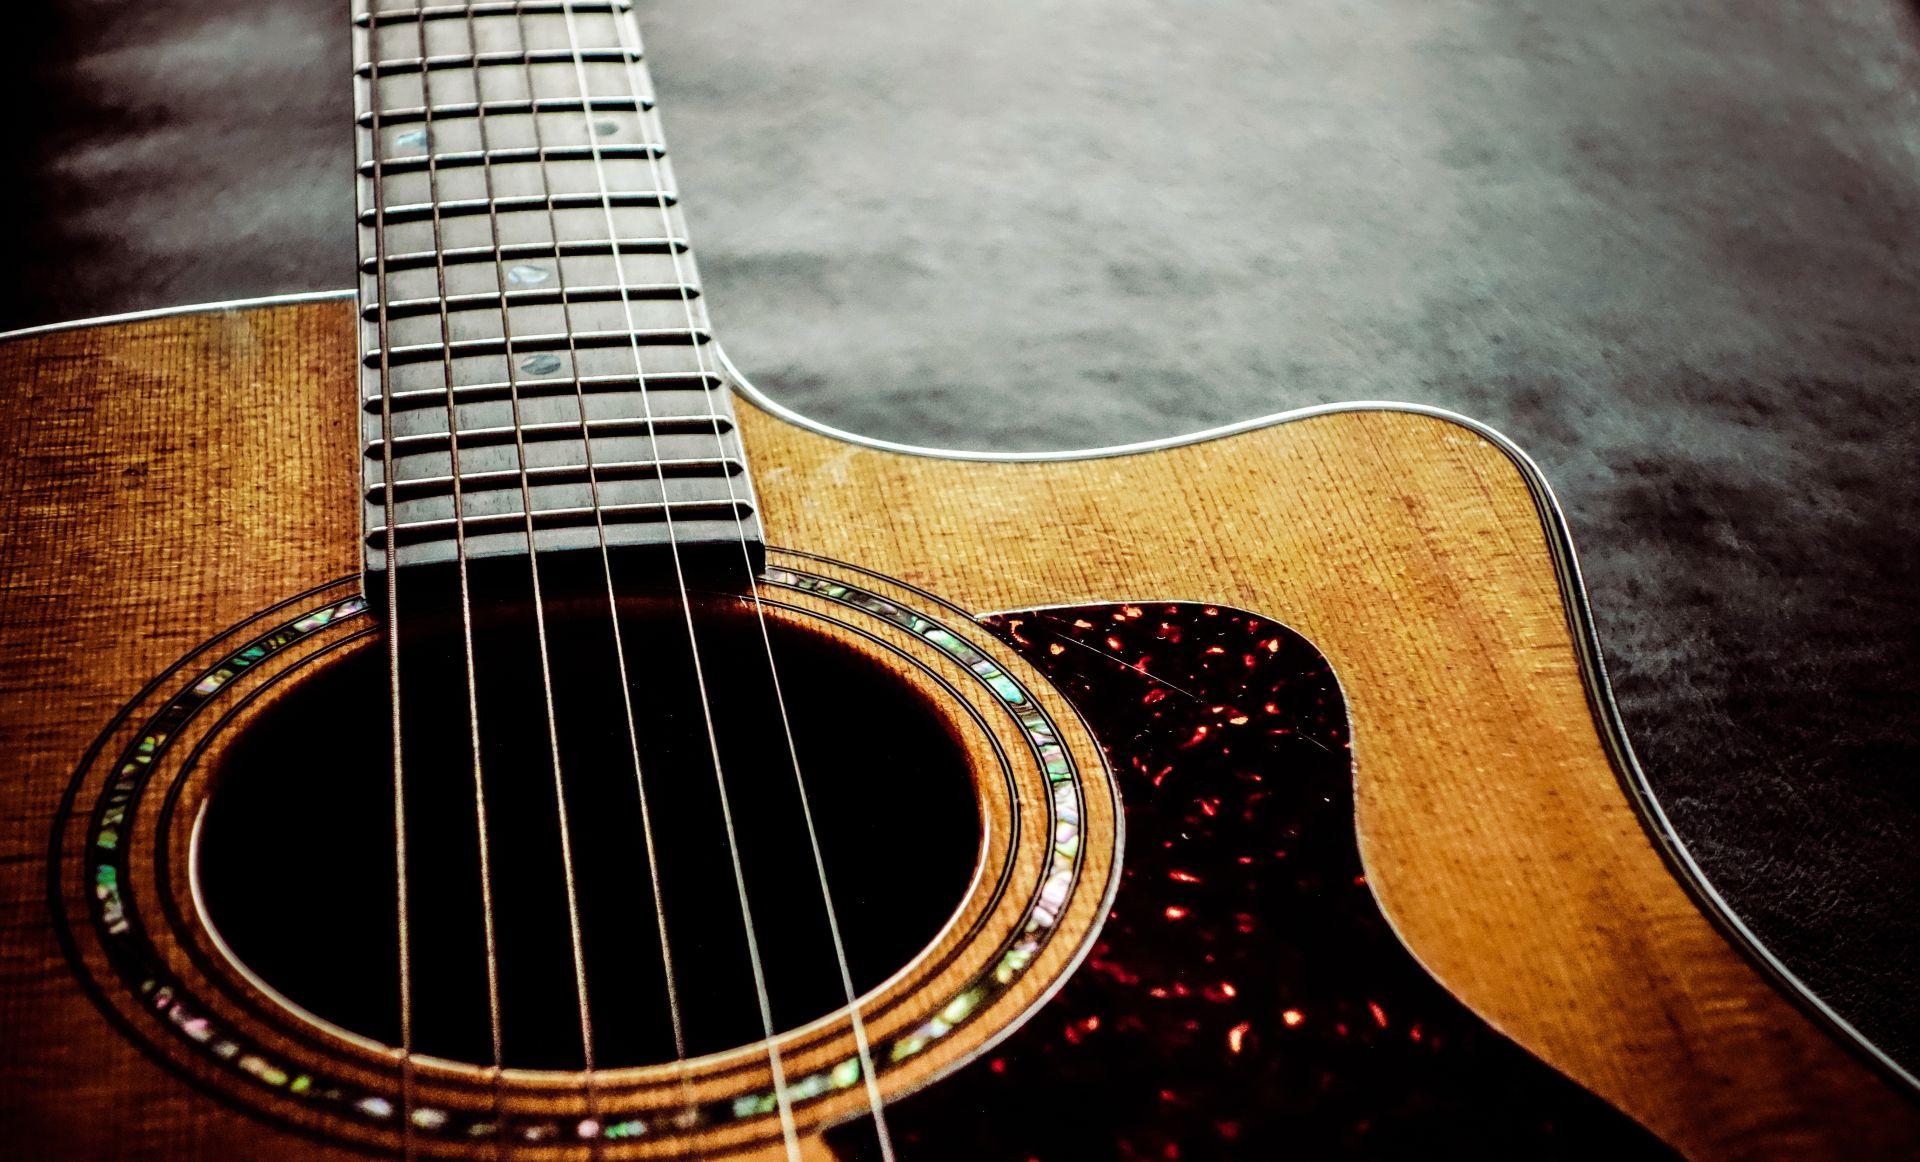 Acoustic Guitar strings, Nice Wallpaper